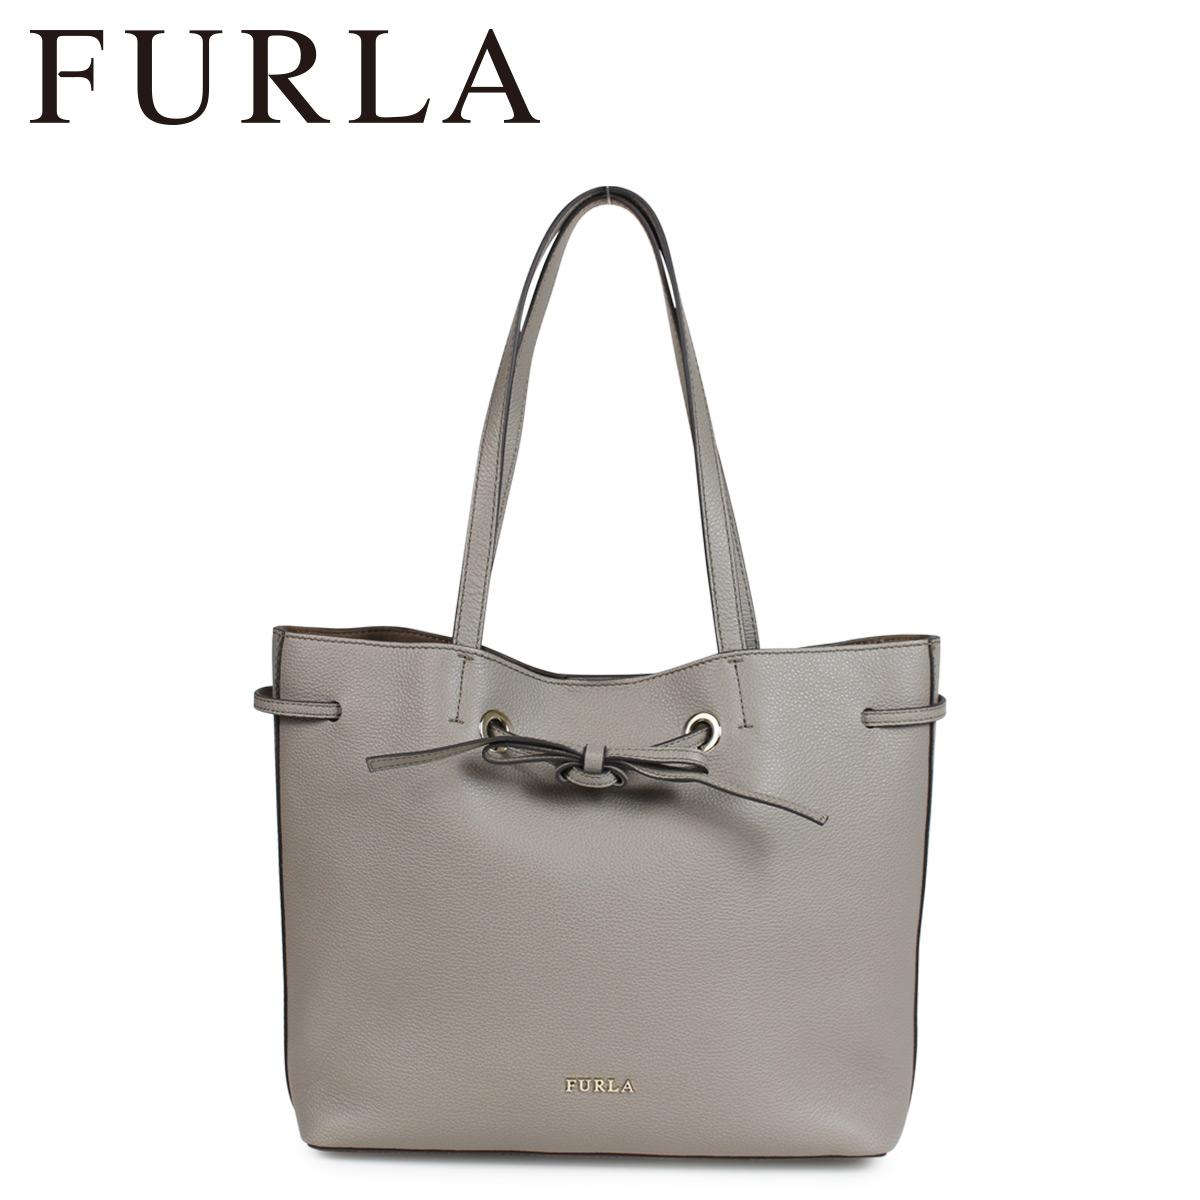 FURLA フルラ バッグ トートバッグ レディース COSTANZA MEDIUM DRAWSTRING BAG ライトグレー 967242